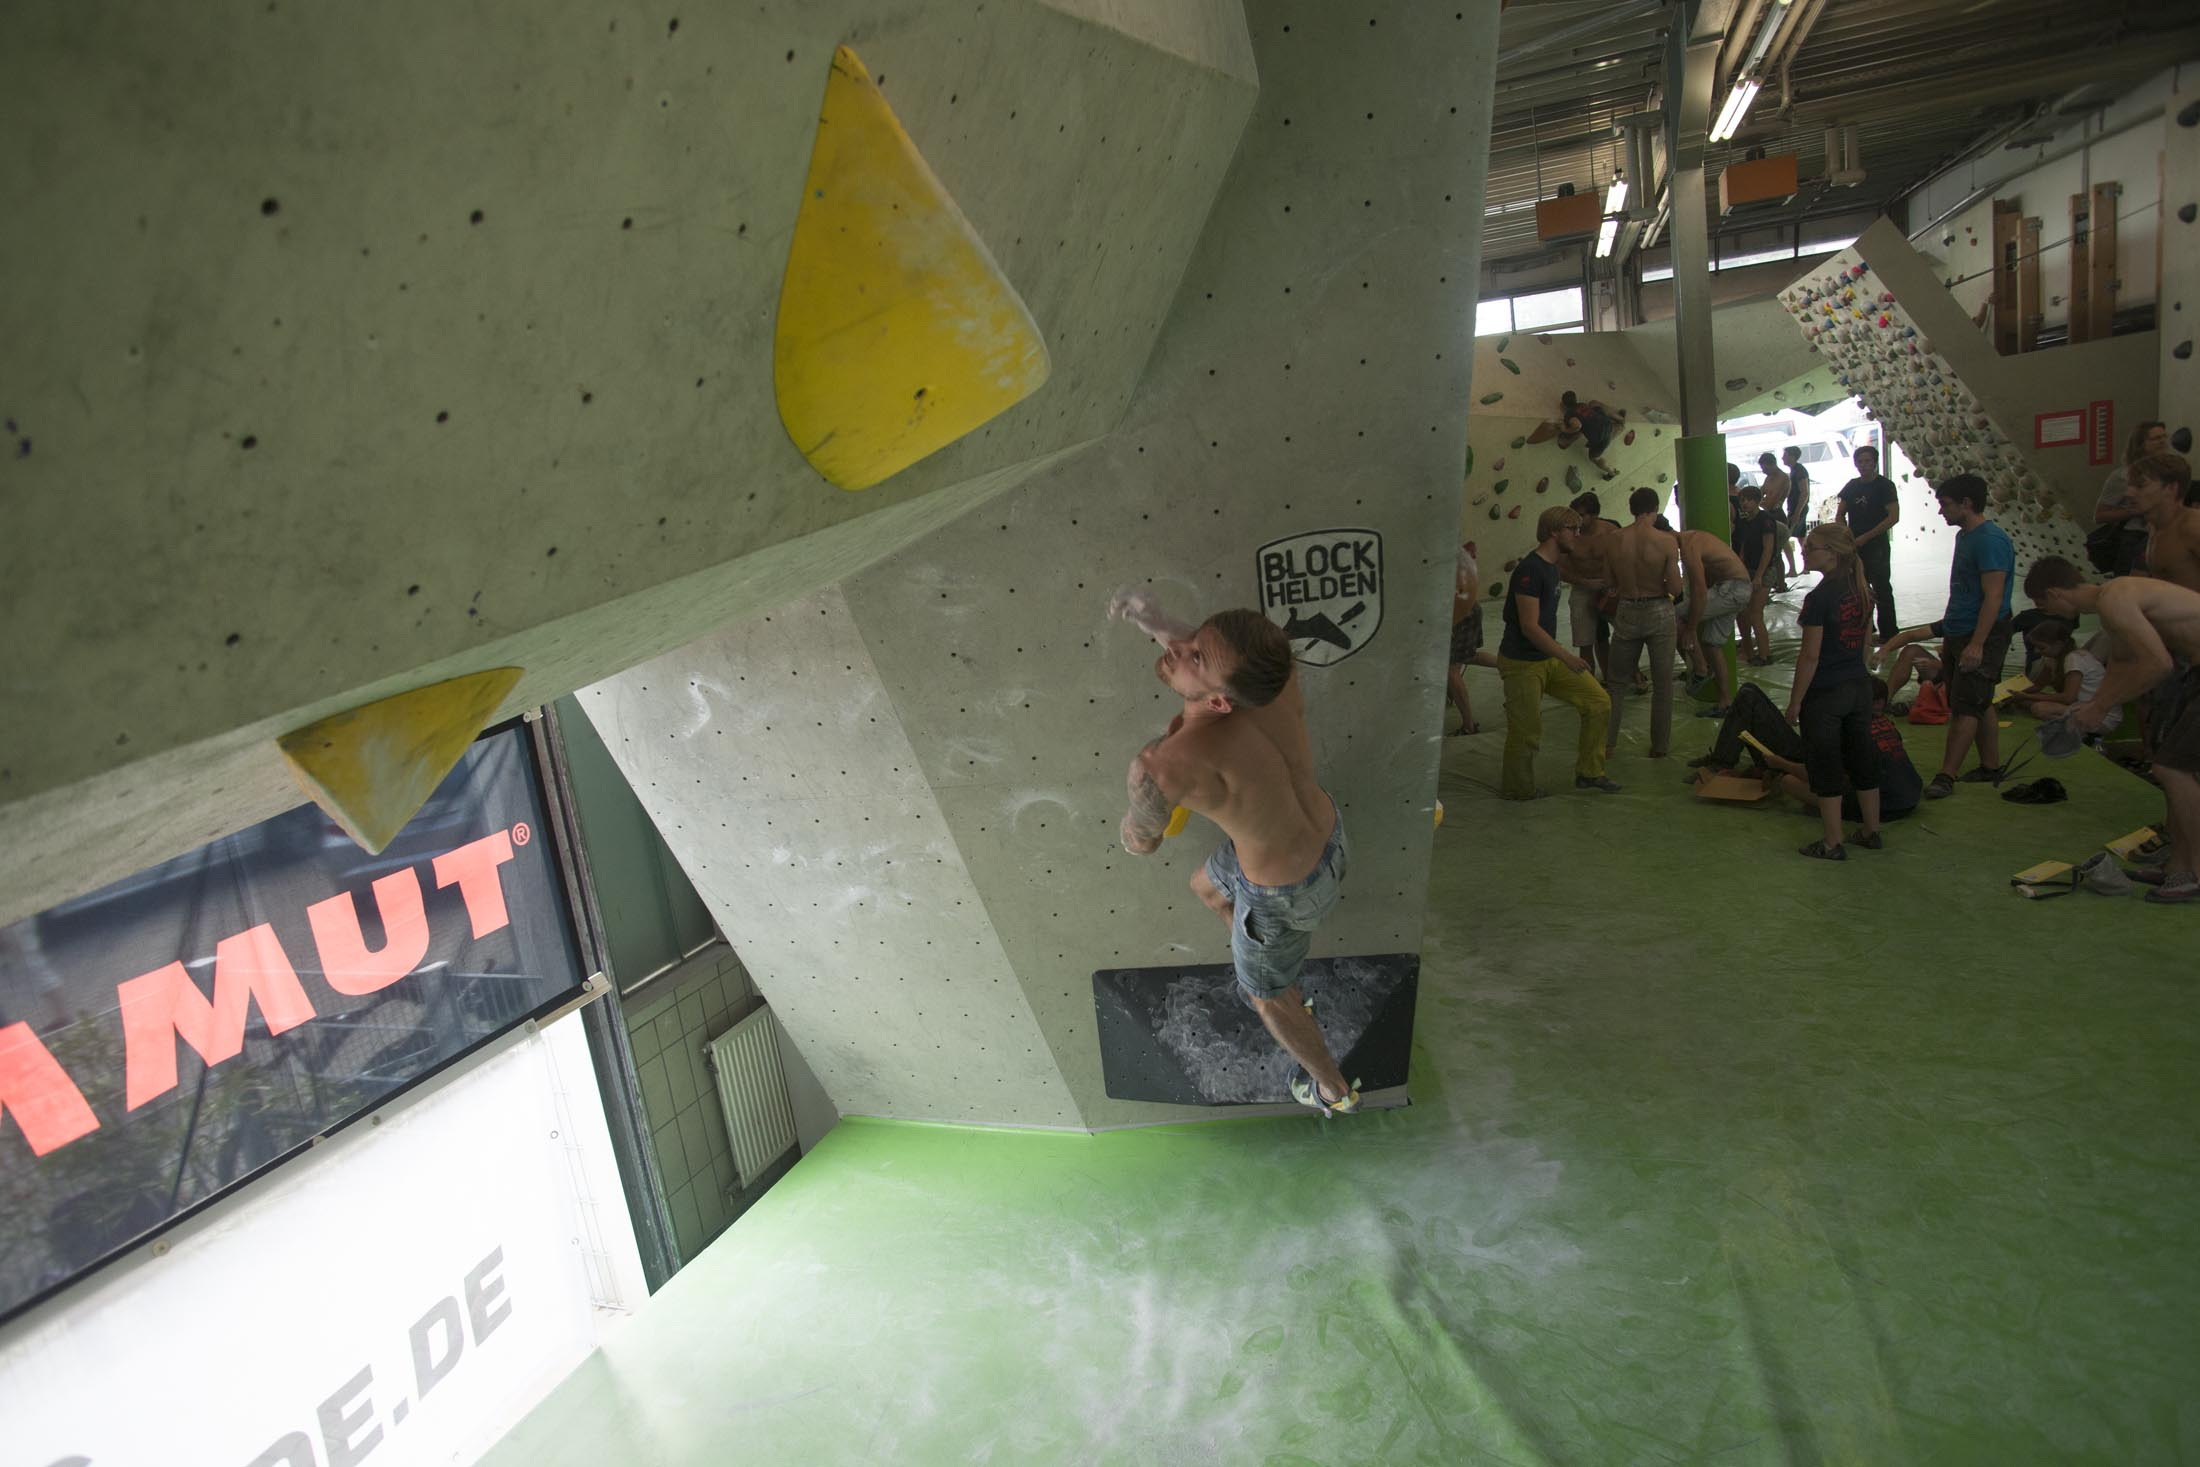 Quali, internationaler bouldercup Frankenjura 2016, BLOCKHELDEN Erlangen, Mammut, Bergfreunde.de, Boulderwettkampf07092016365